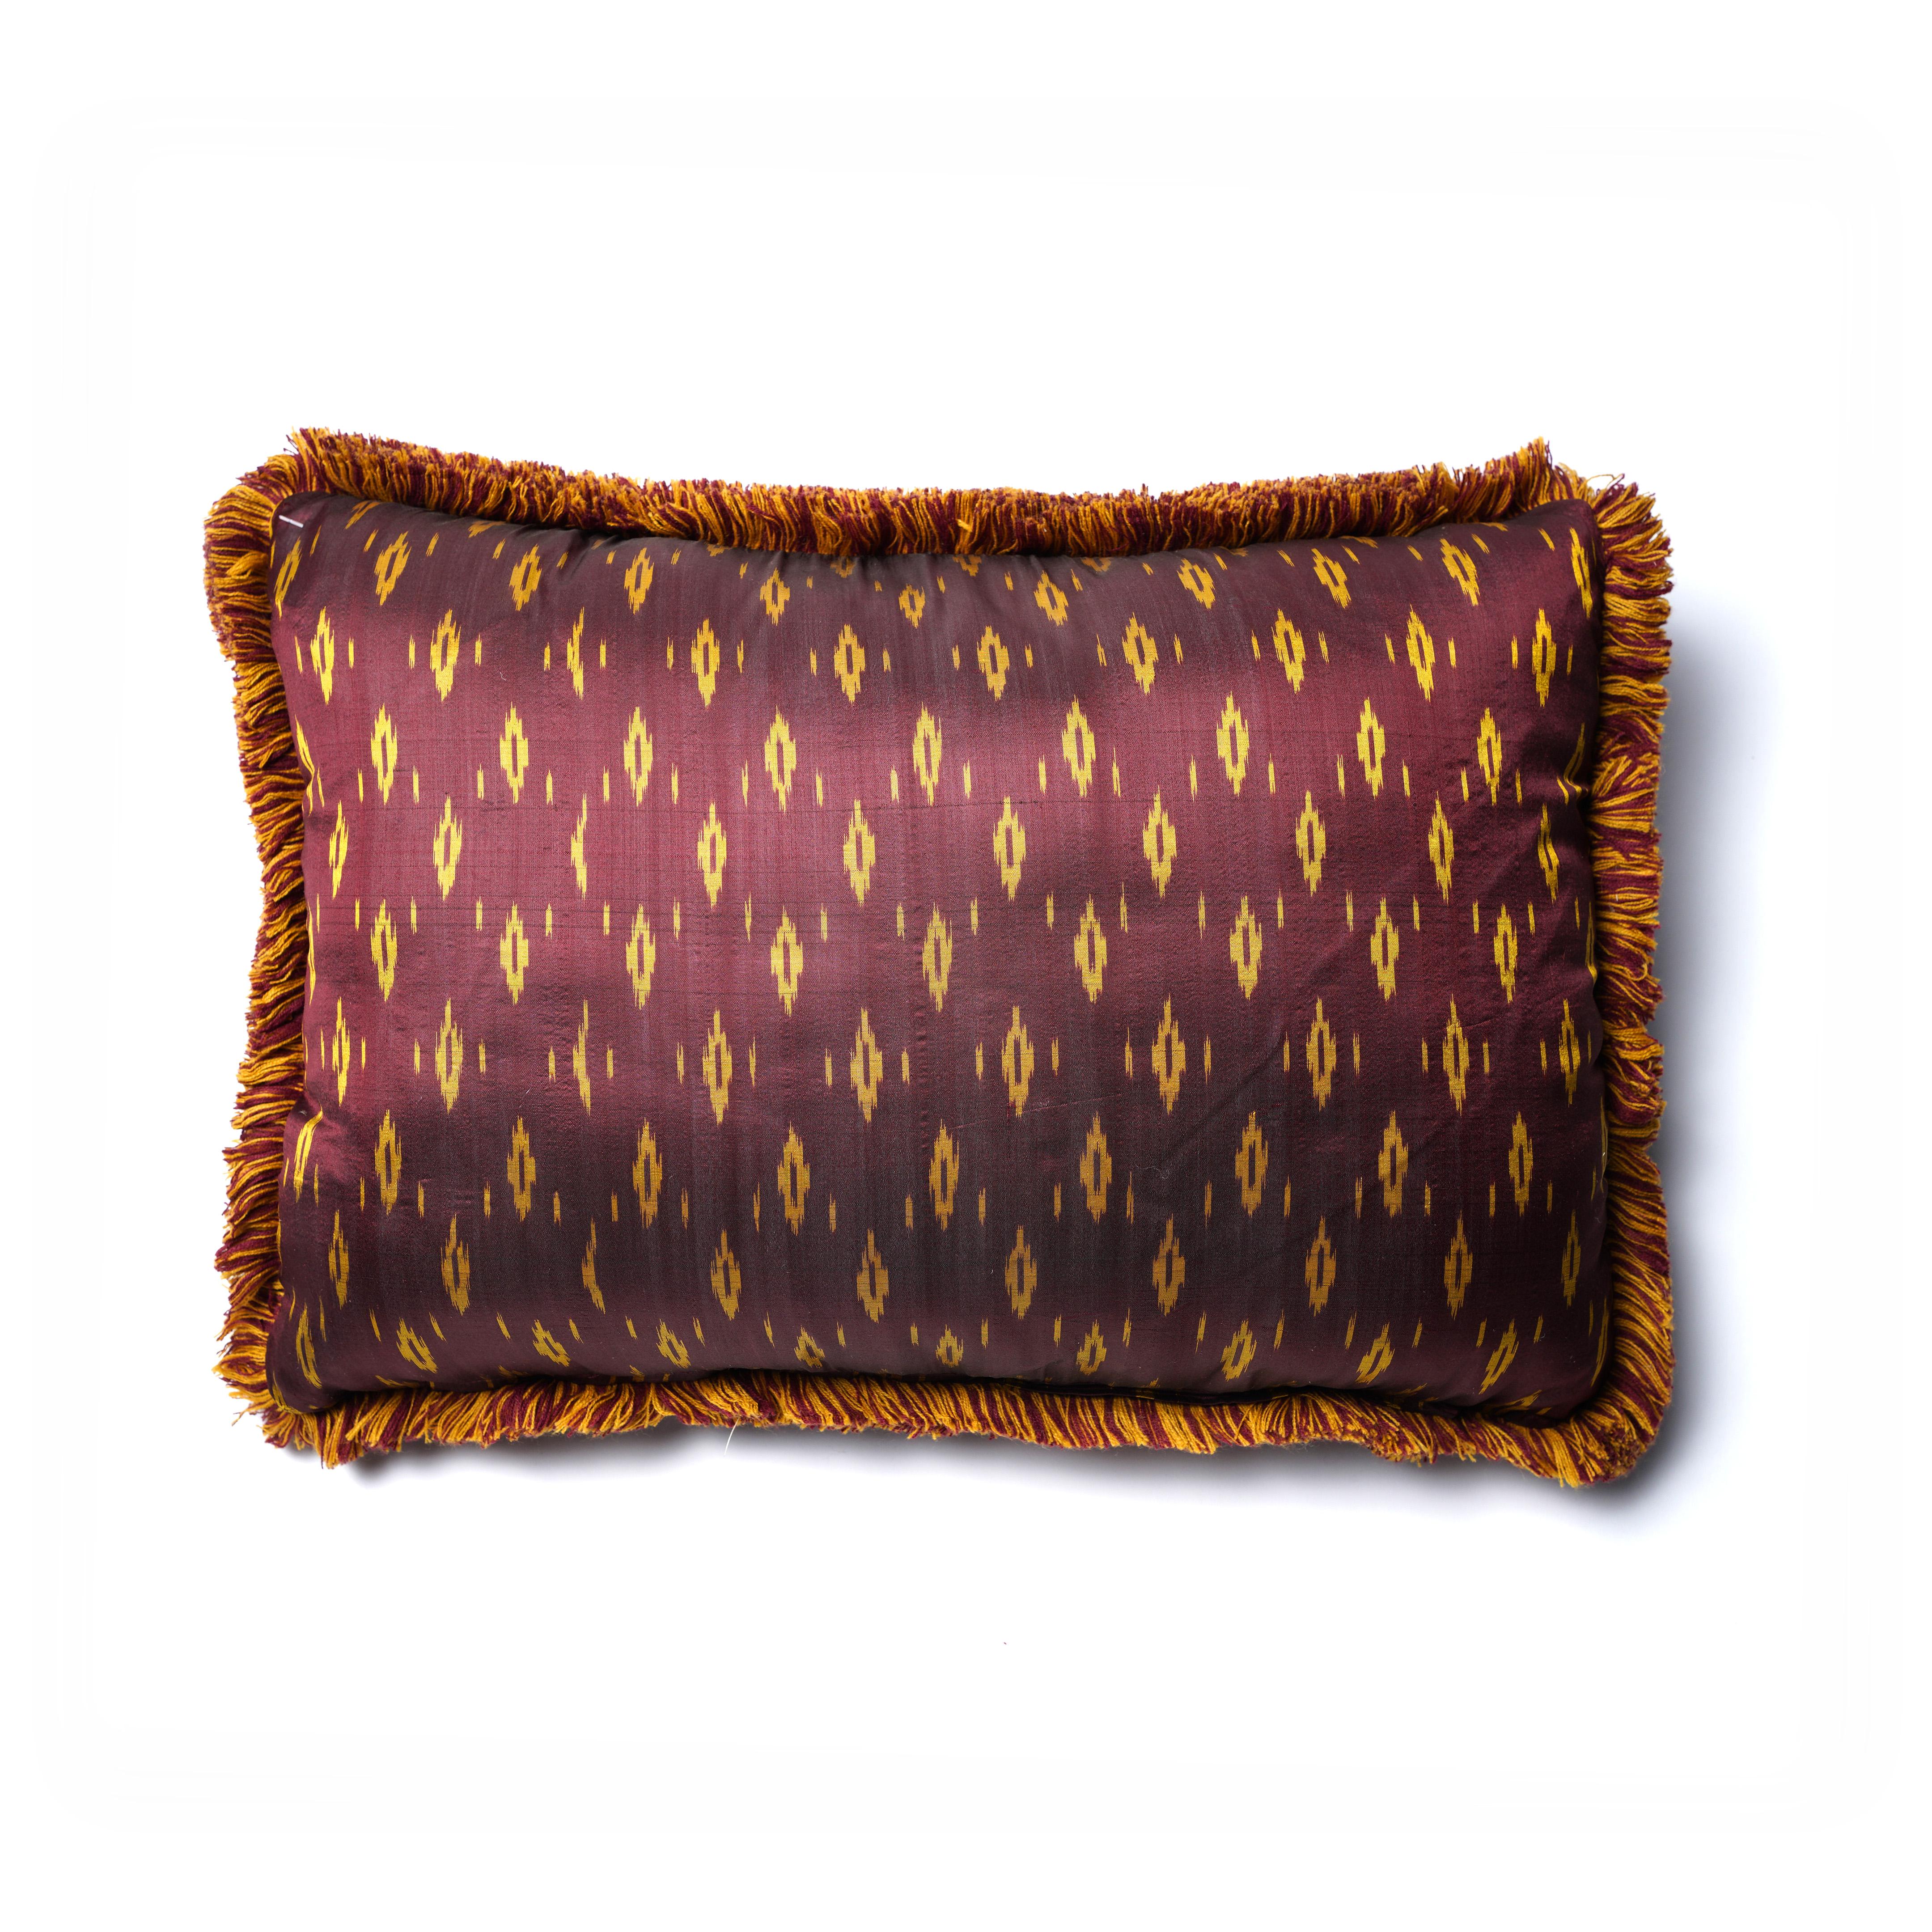 Almohadón de seda bordeaux Marabú